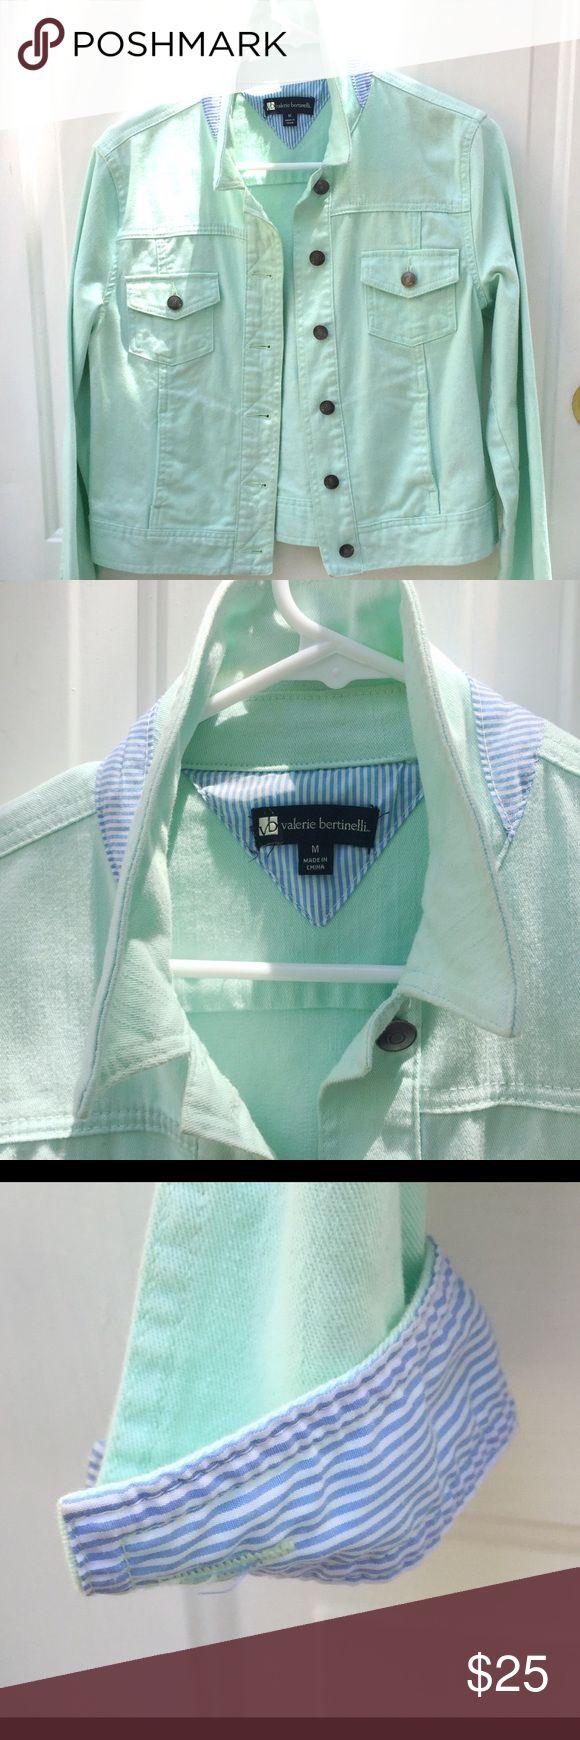 Valerie Bertonli green jean jacket Valerie Bertonli mint green jean jacket in a light stretch cotton blend ...cool striped lining on cuffs and collar ..lightly worn valerie bertonelli Jackets & Coats Jean Jackets